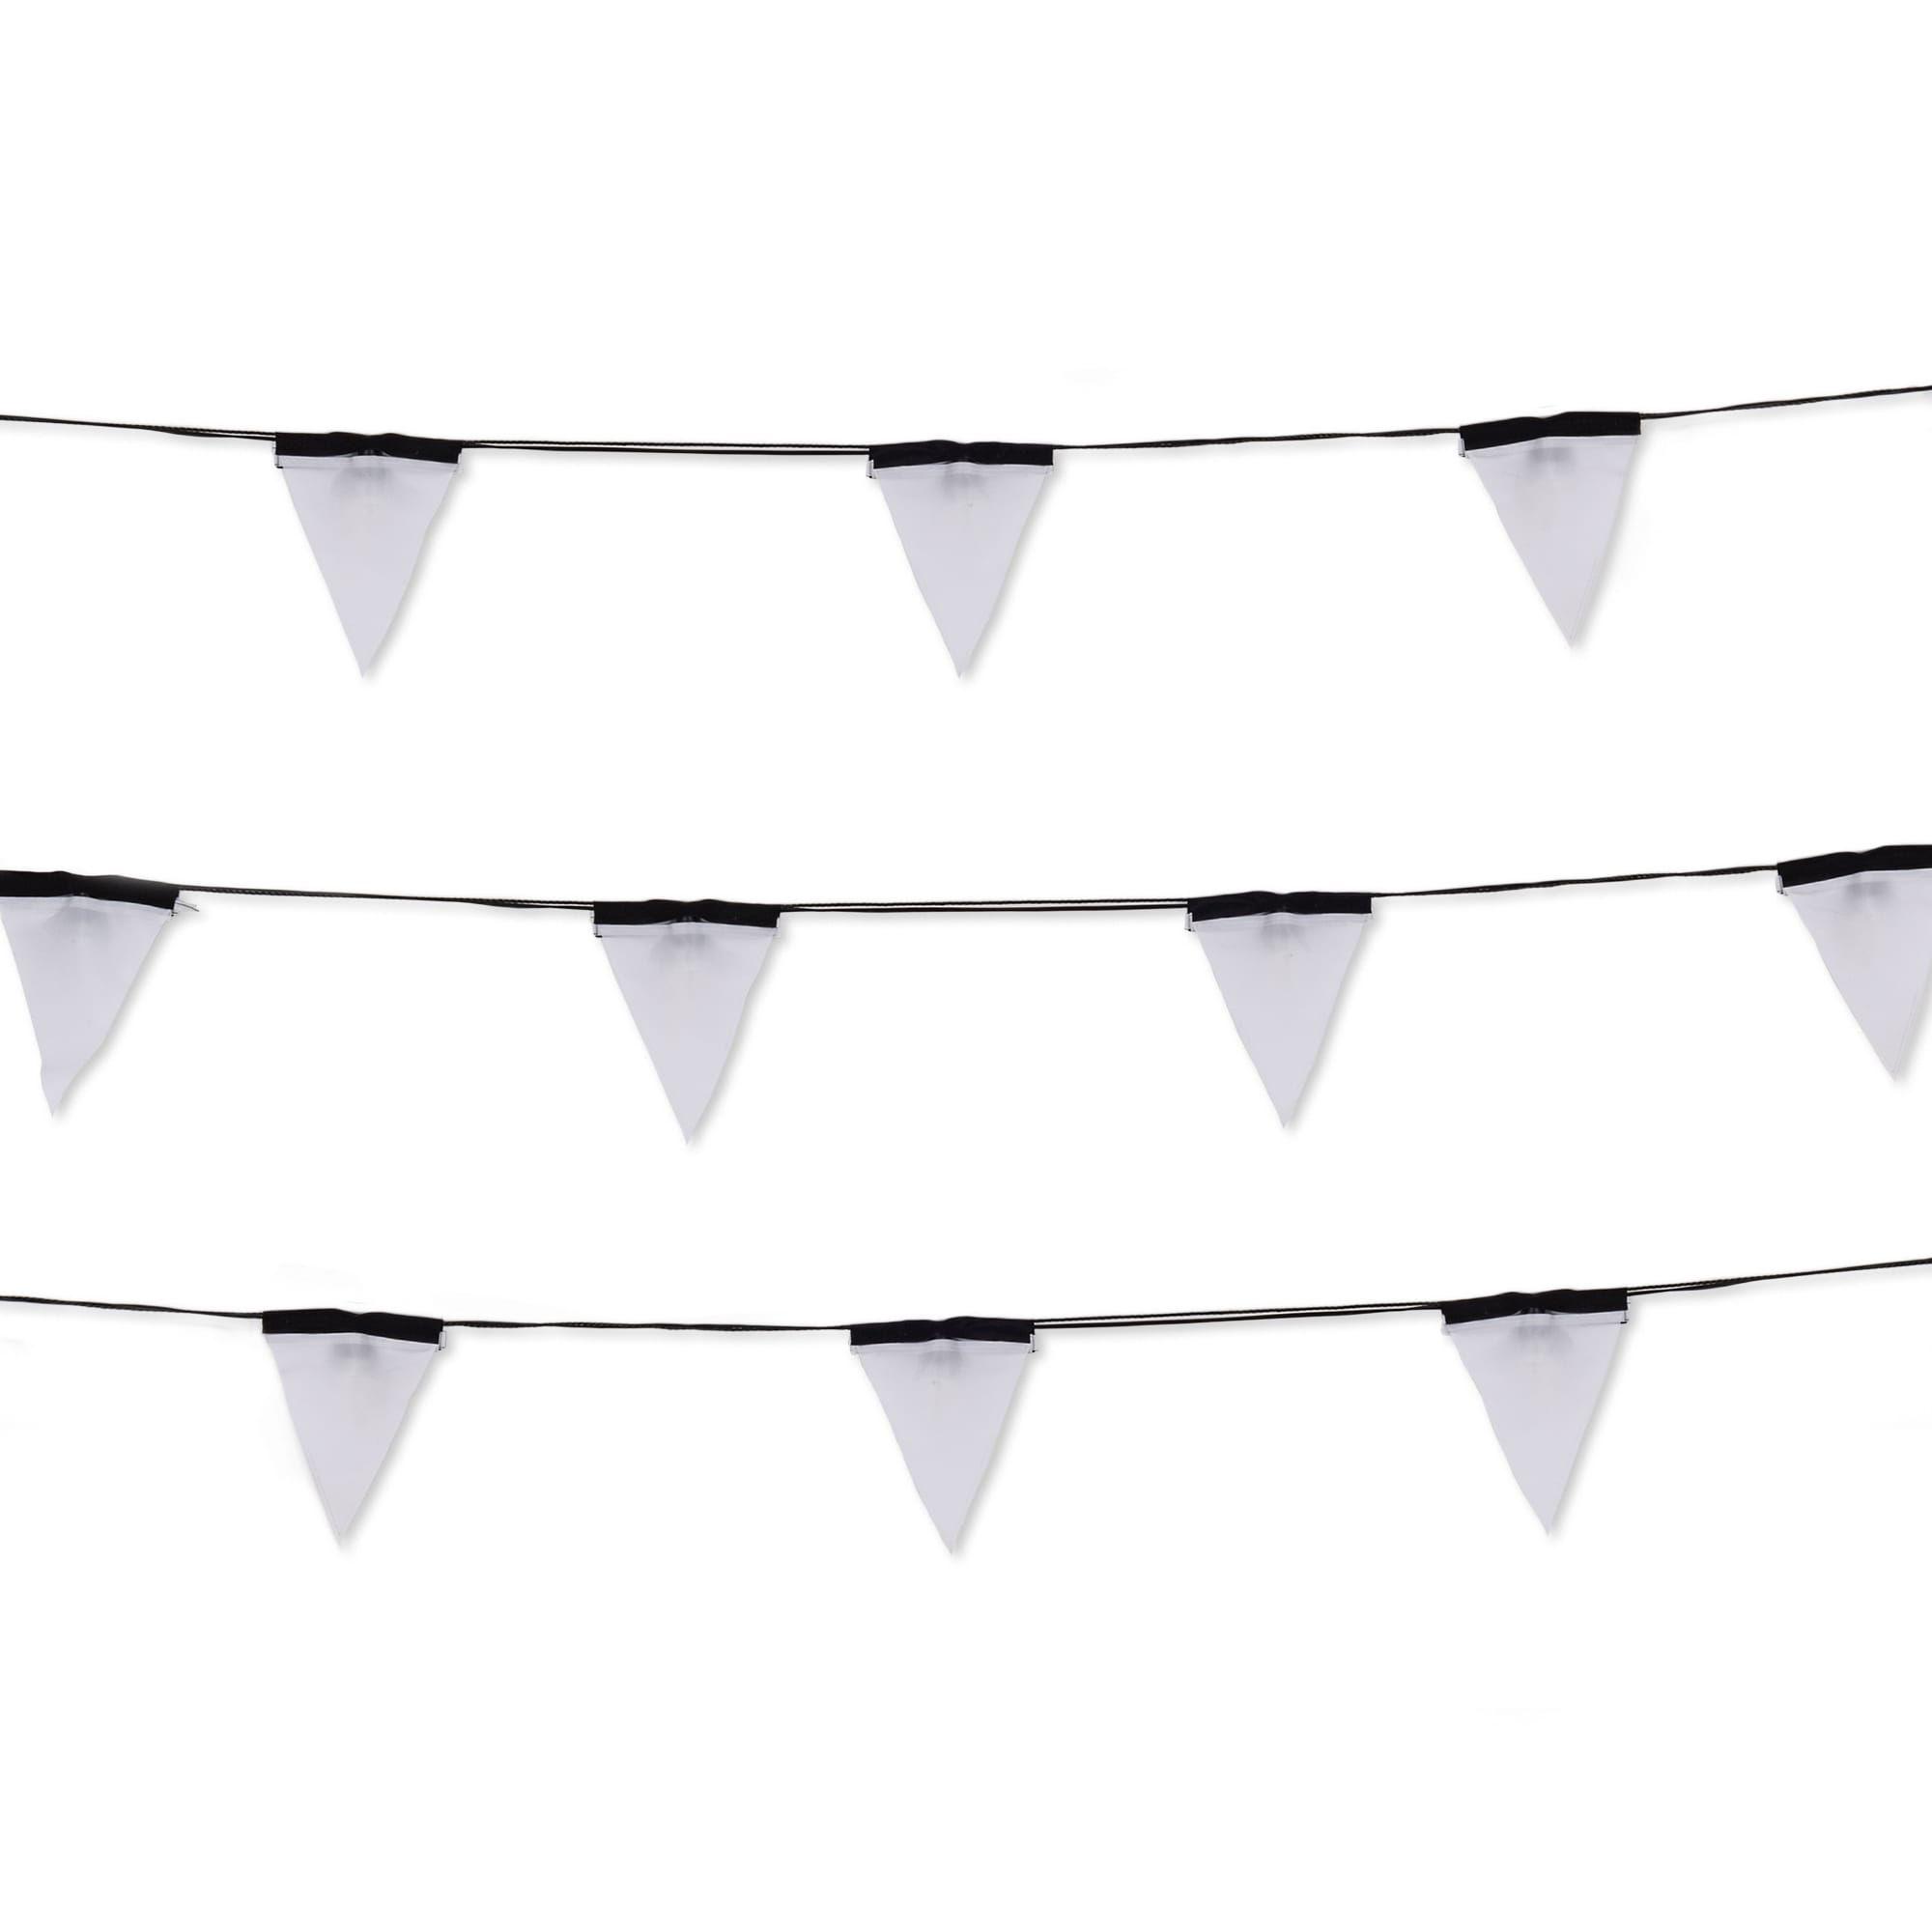 Interni - Per bambini - Ghirlanda luminosa Sagra - LED / 16 bandierine tessuto - Interno & esterno di Seletti - Ghirlanda / Nero & Bianco - policarbonato, PVC, Tessuto poliestere